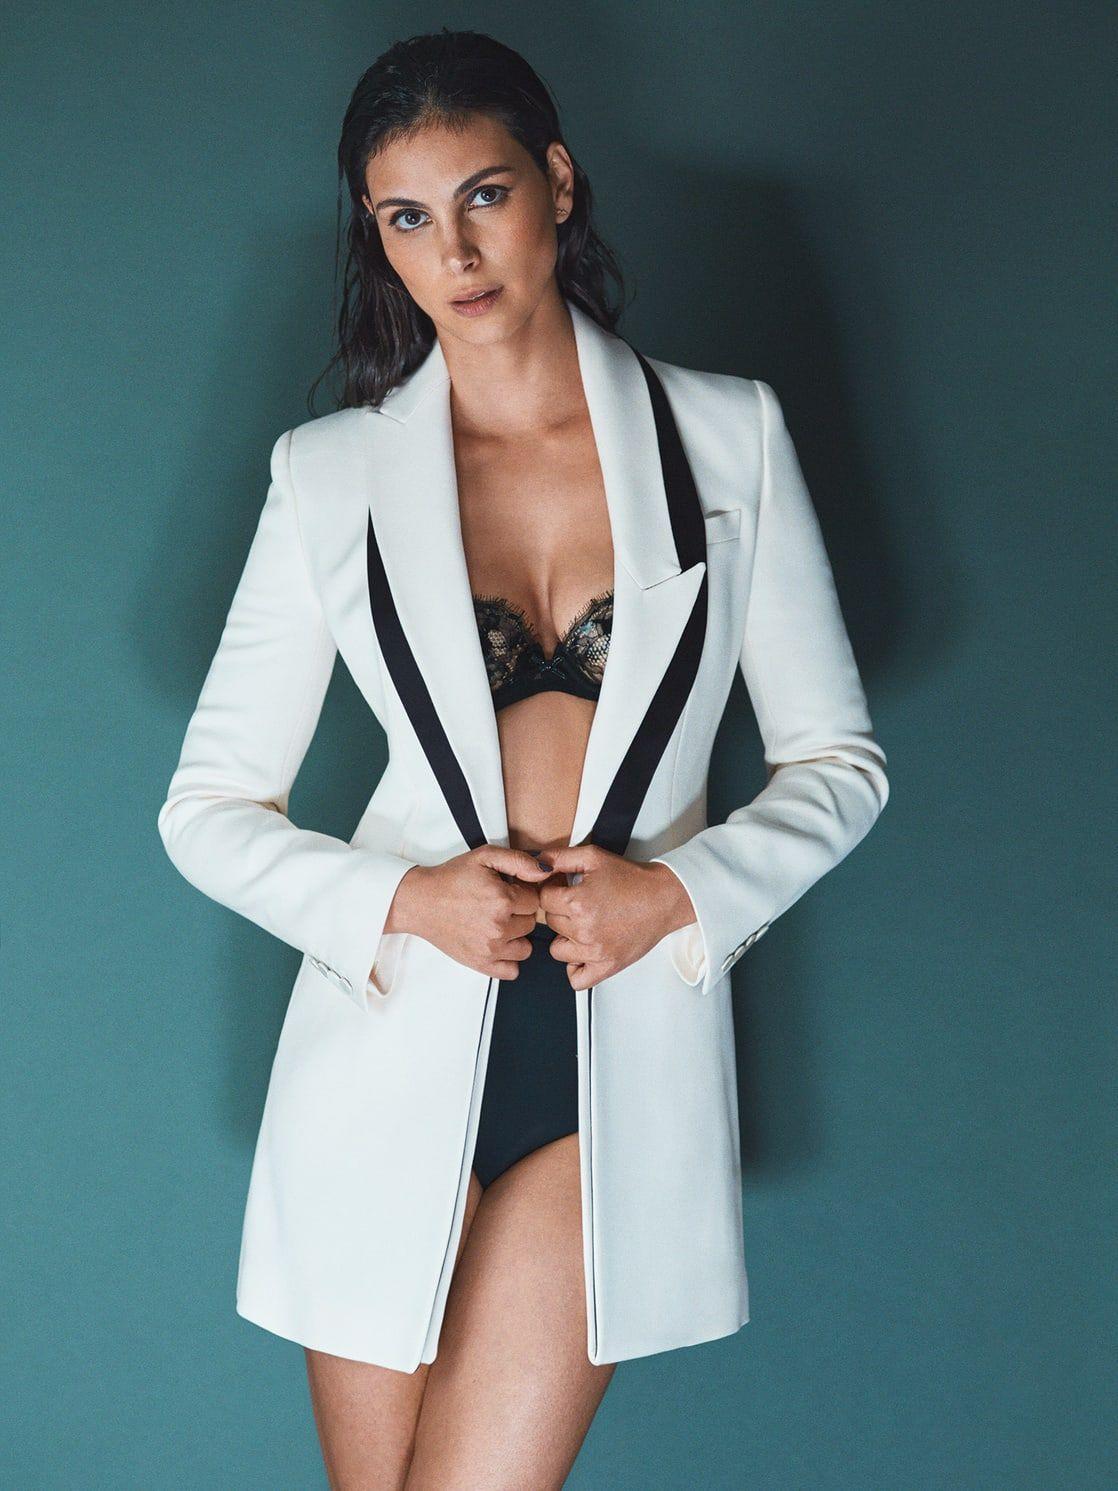 Communication on this topic: Mimi gutierrez sexy, christina-aguilera-sexy/